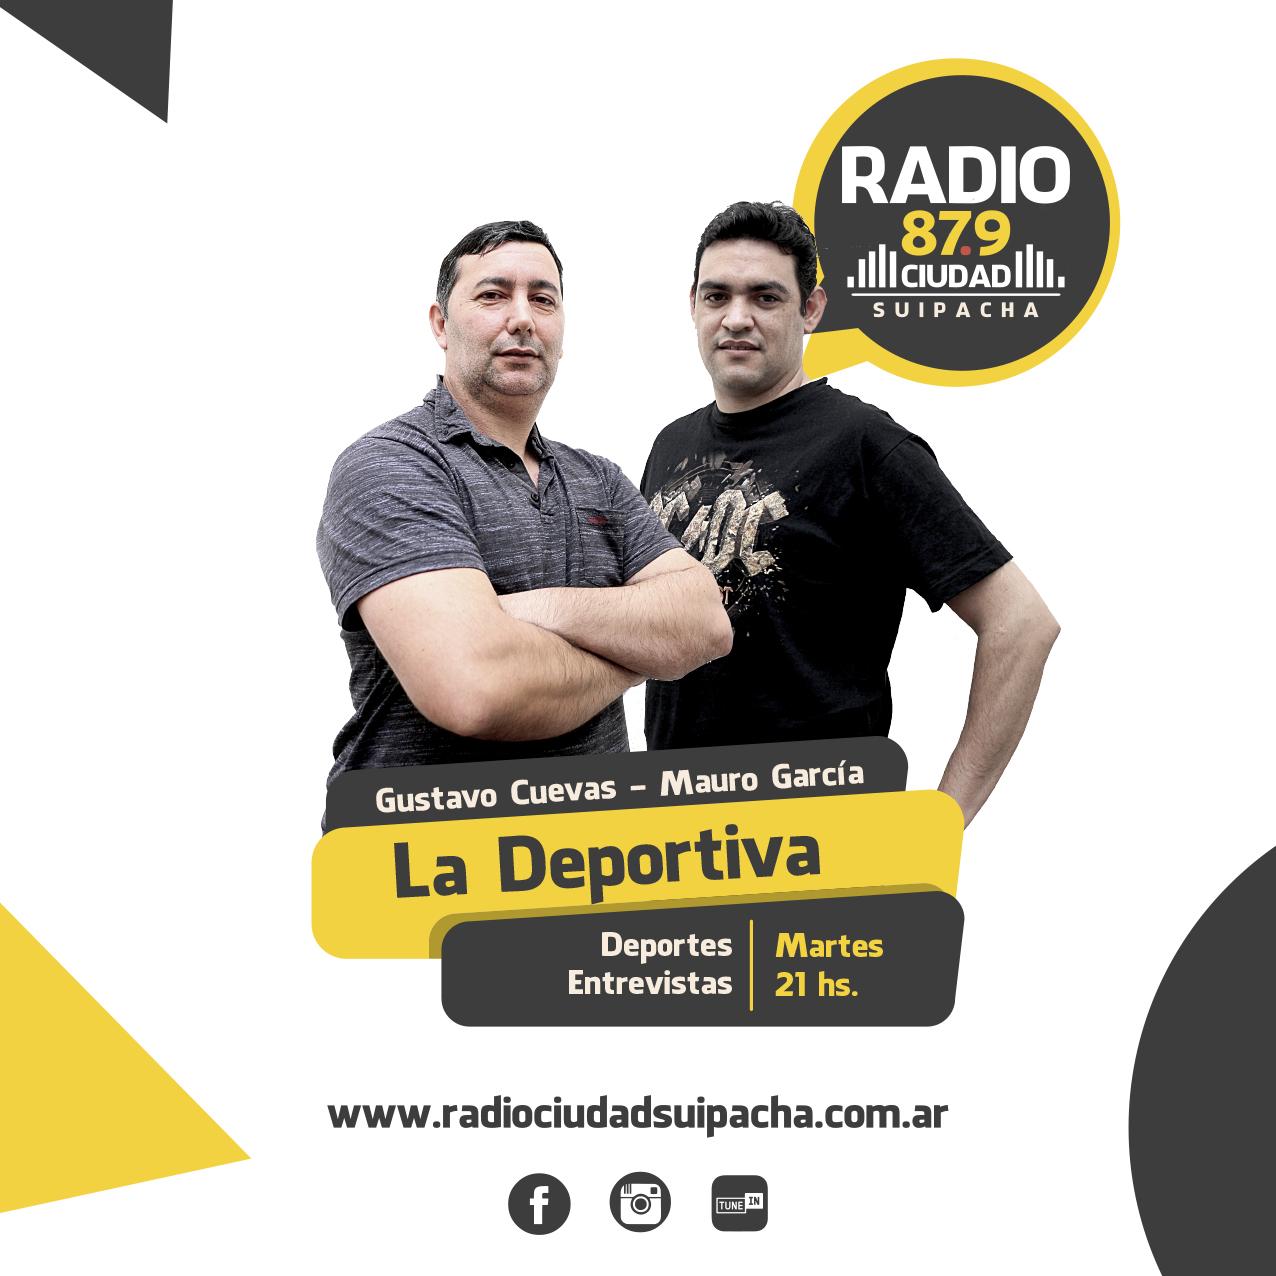 DEPORTIVA FEED 2021 RADIO CIUDAD SUIPACHA